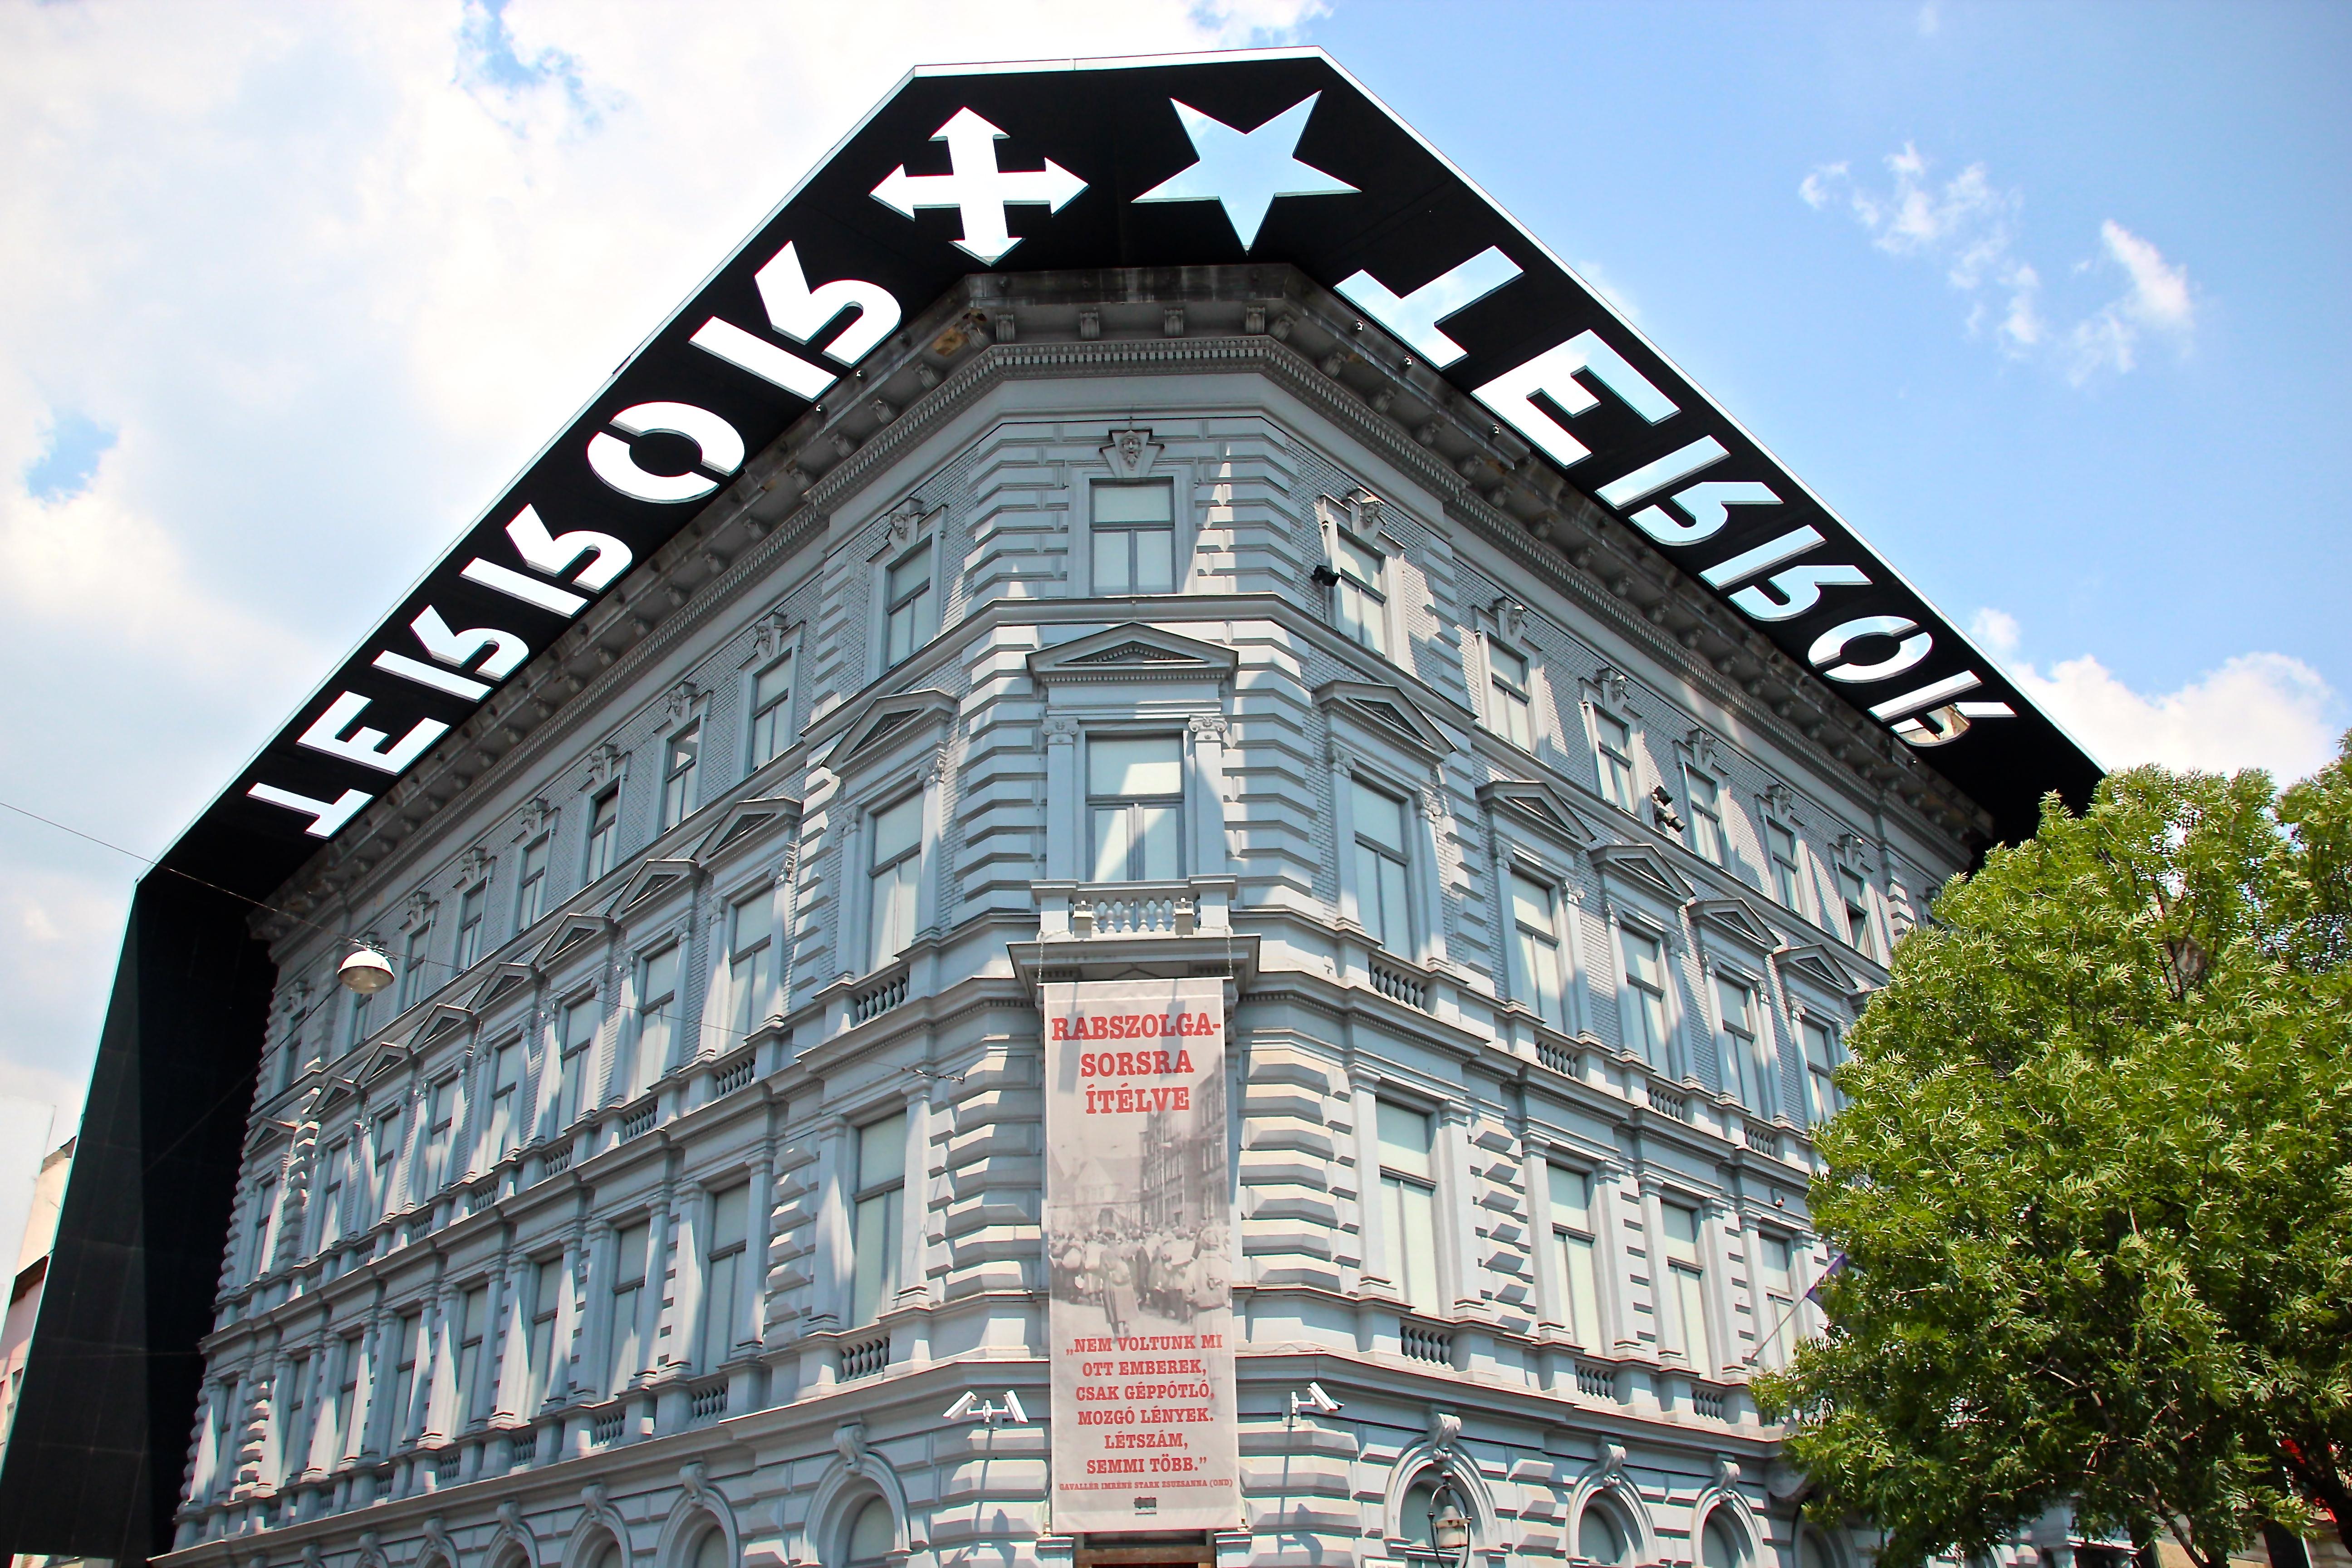 The Terror Museum